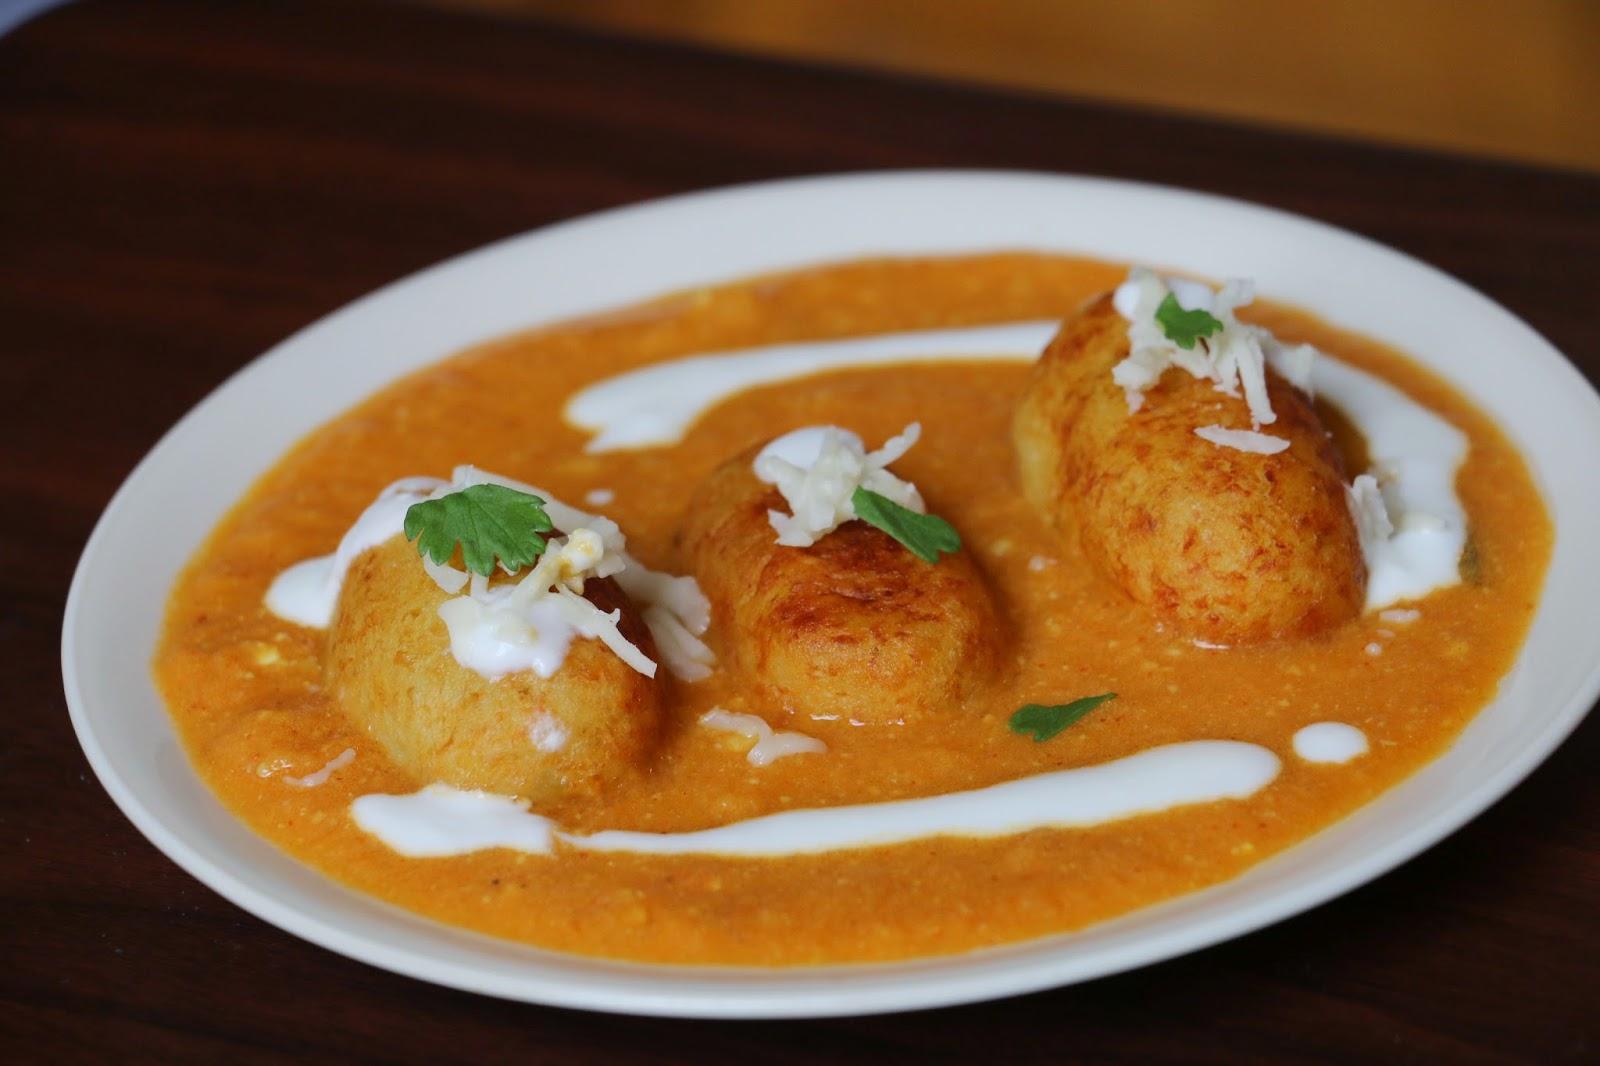 07f30498fbe yummy delight for u: Malai Kofta Curry Recipe, How to Make Malai Kofta